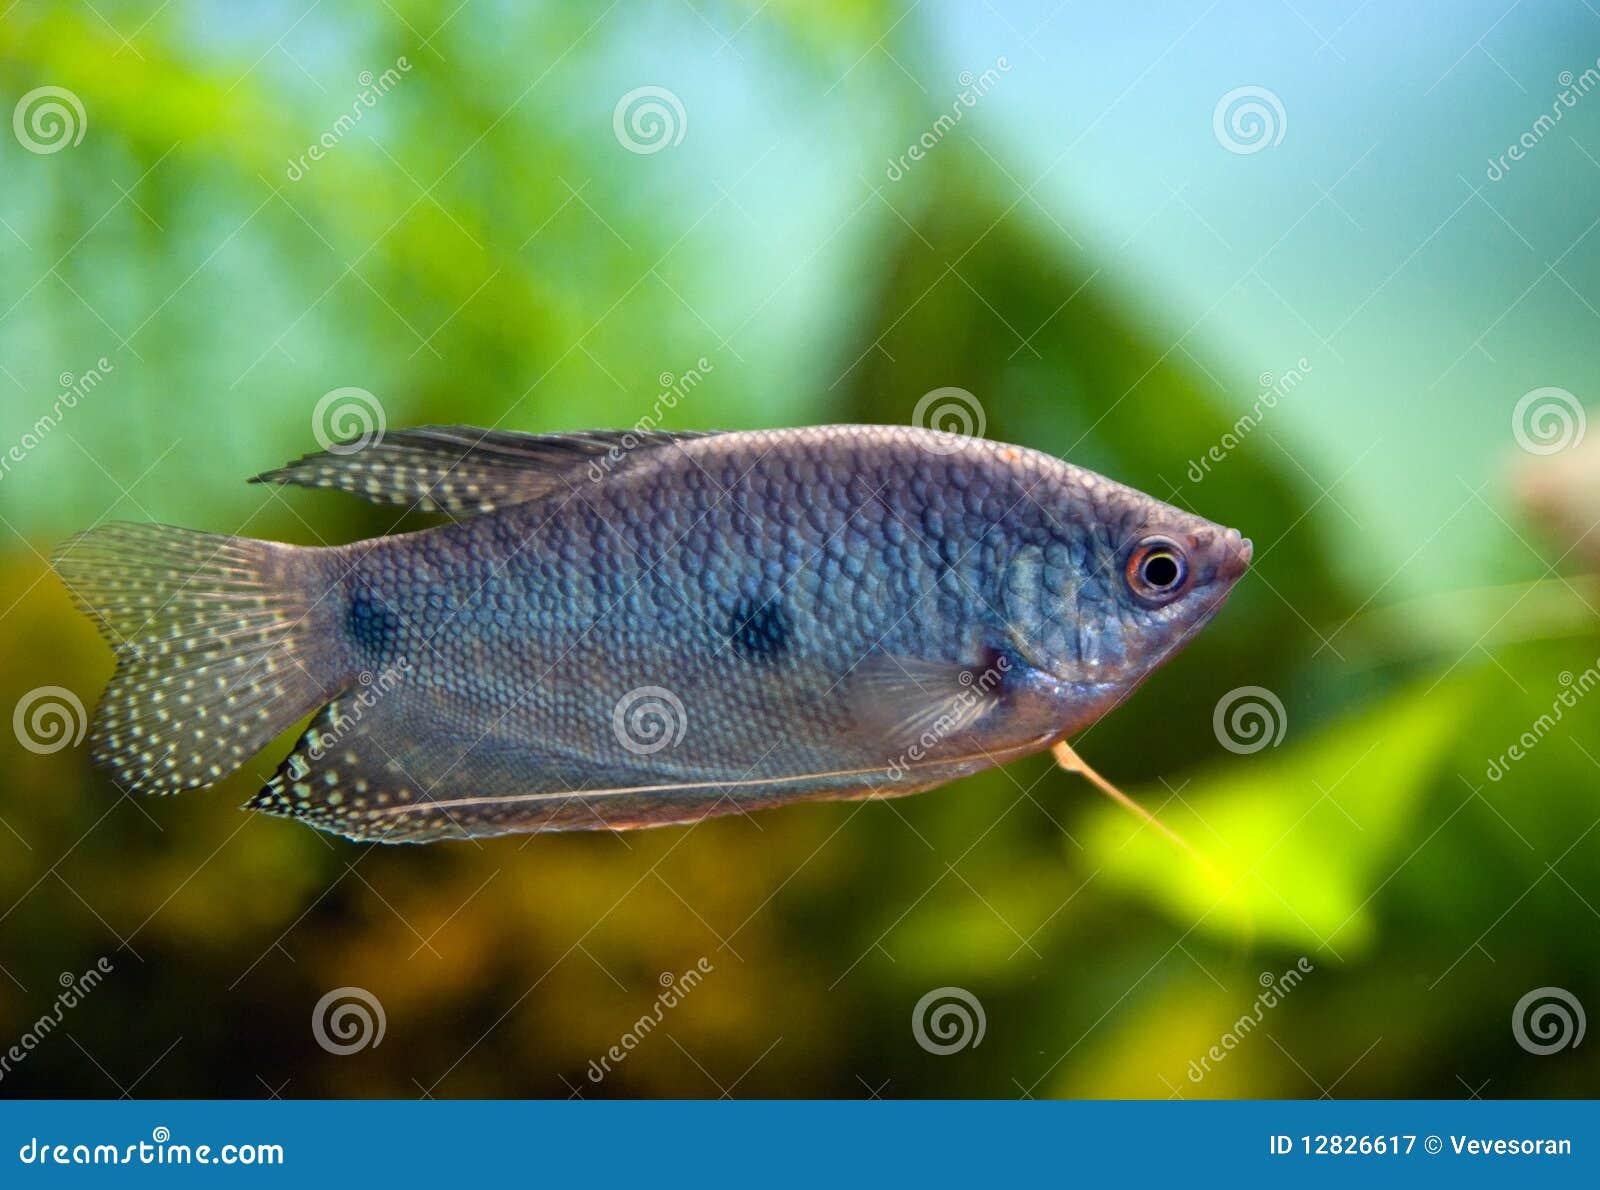 Aquarium Fish Blue Gourami Royalty Free Stock